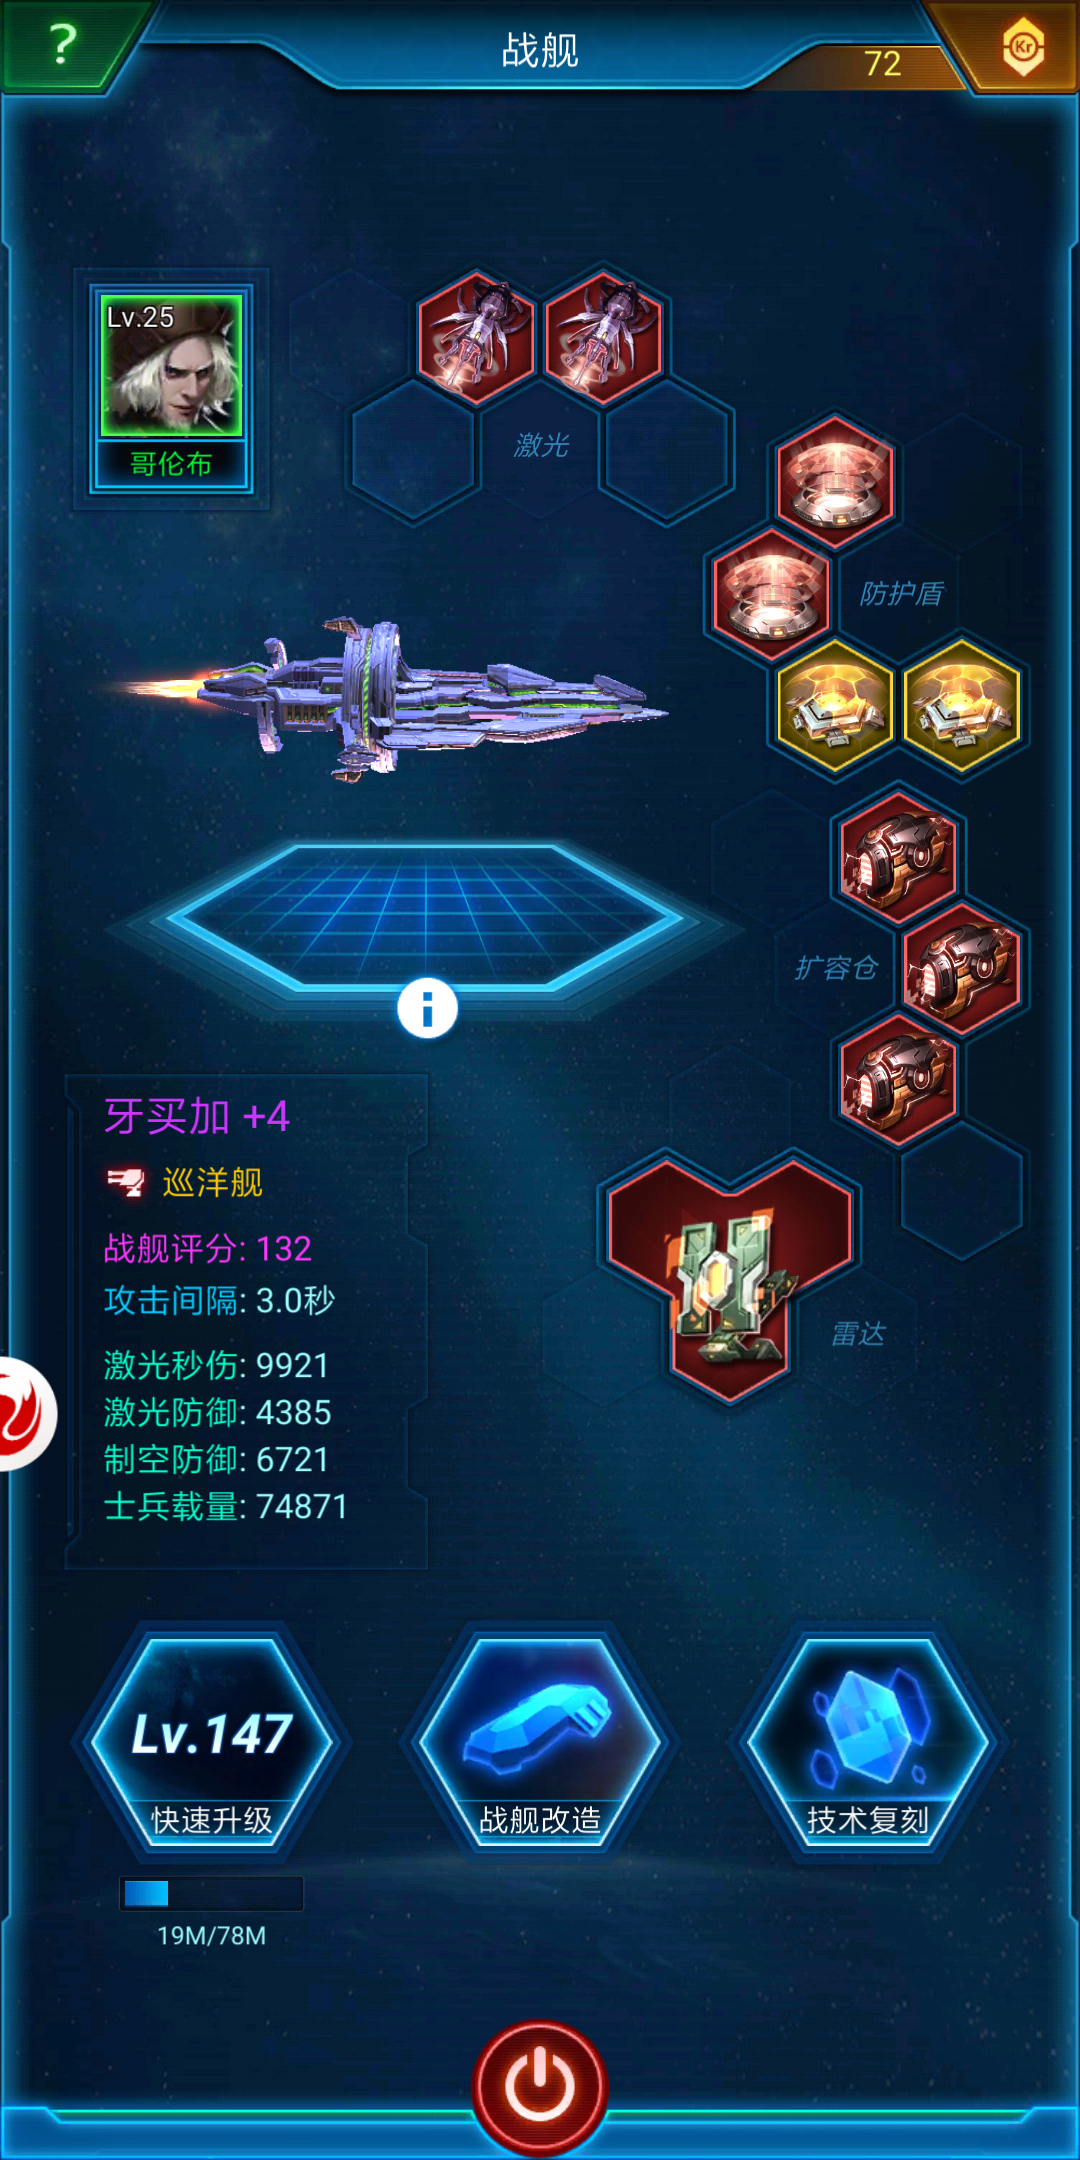 Screenshot_2019-10-04-13-03-16-776_com.yhzj.jedi.yueqiu.png